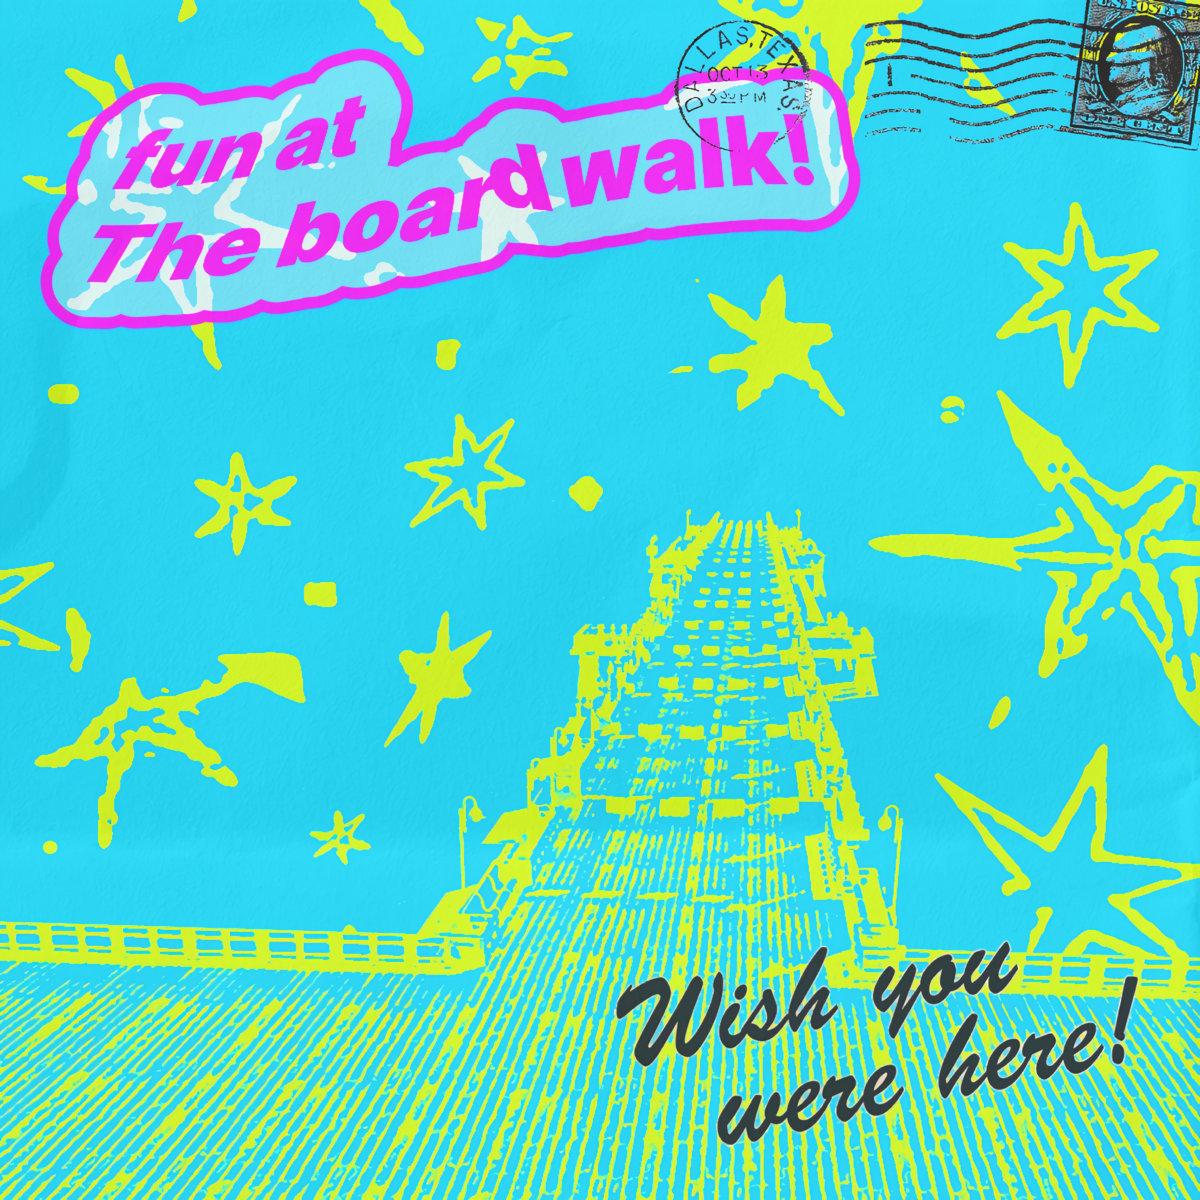 secat | fun at the boardwalk! | Self-Released